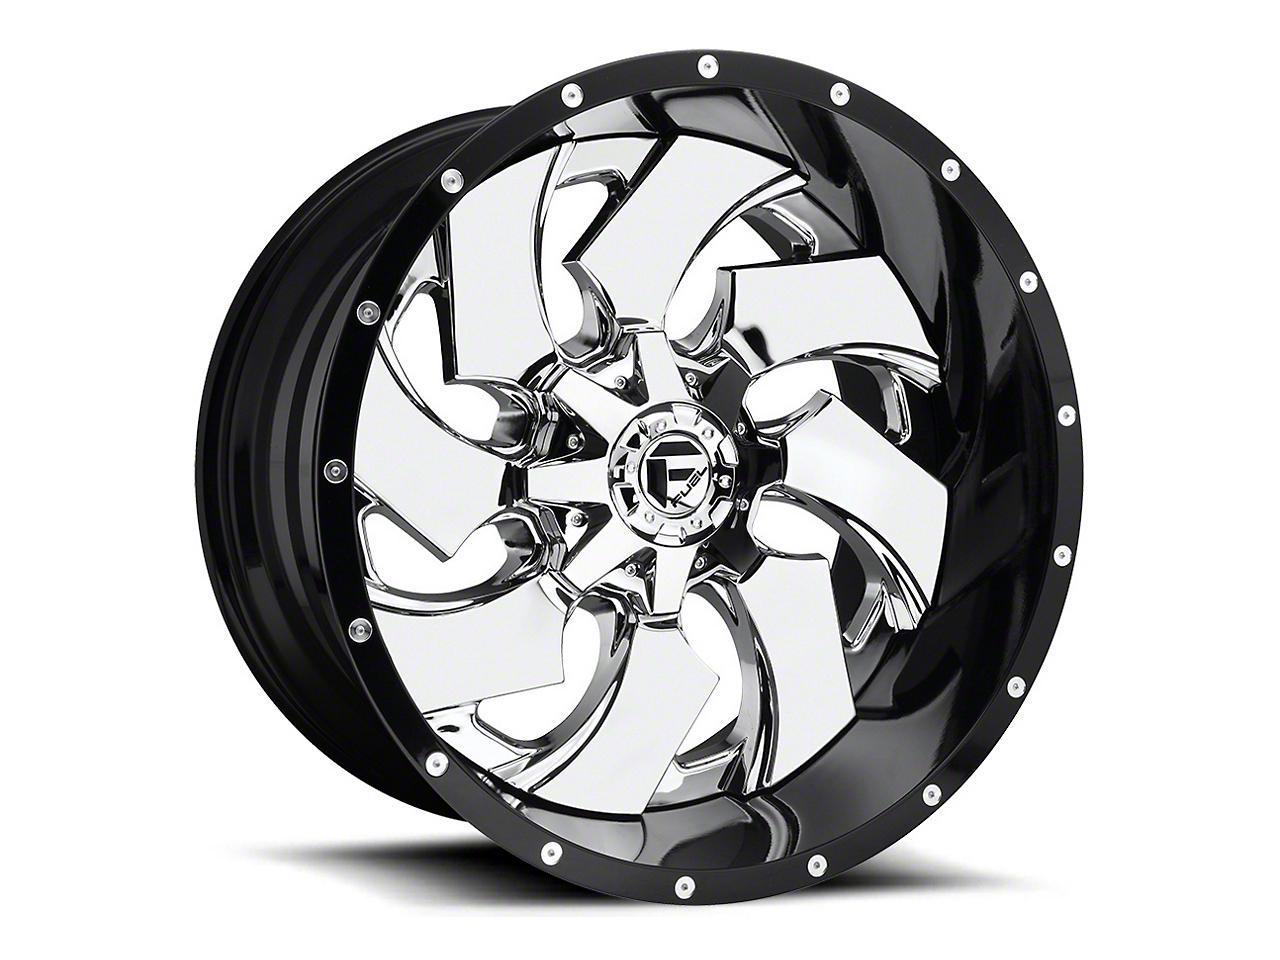 Fuel Wheels Cleaver Chrome 6-Lug Wheel - 20x10 (04-19 F-150)